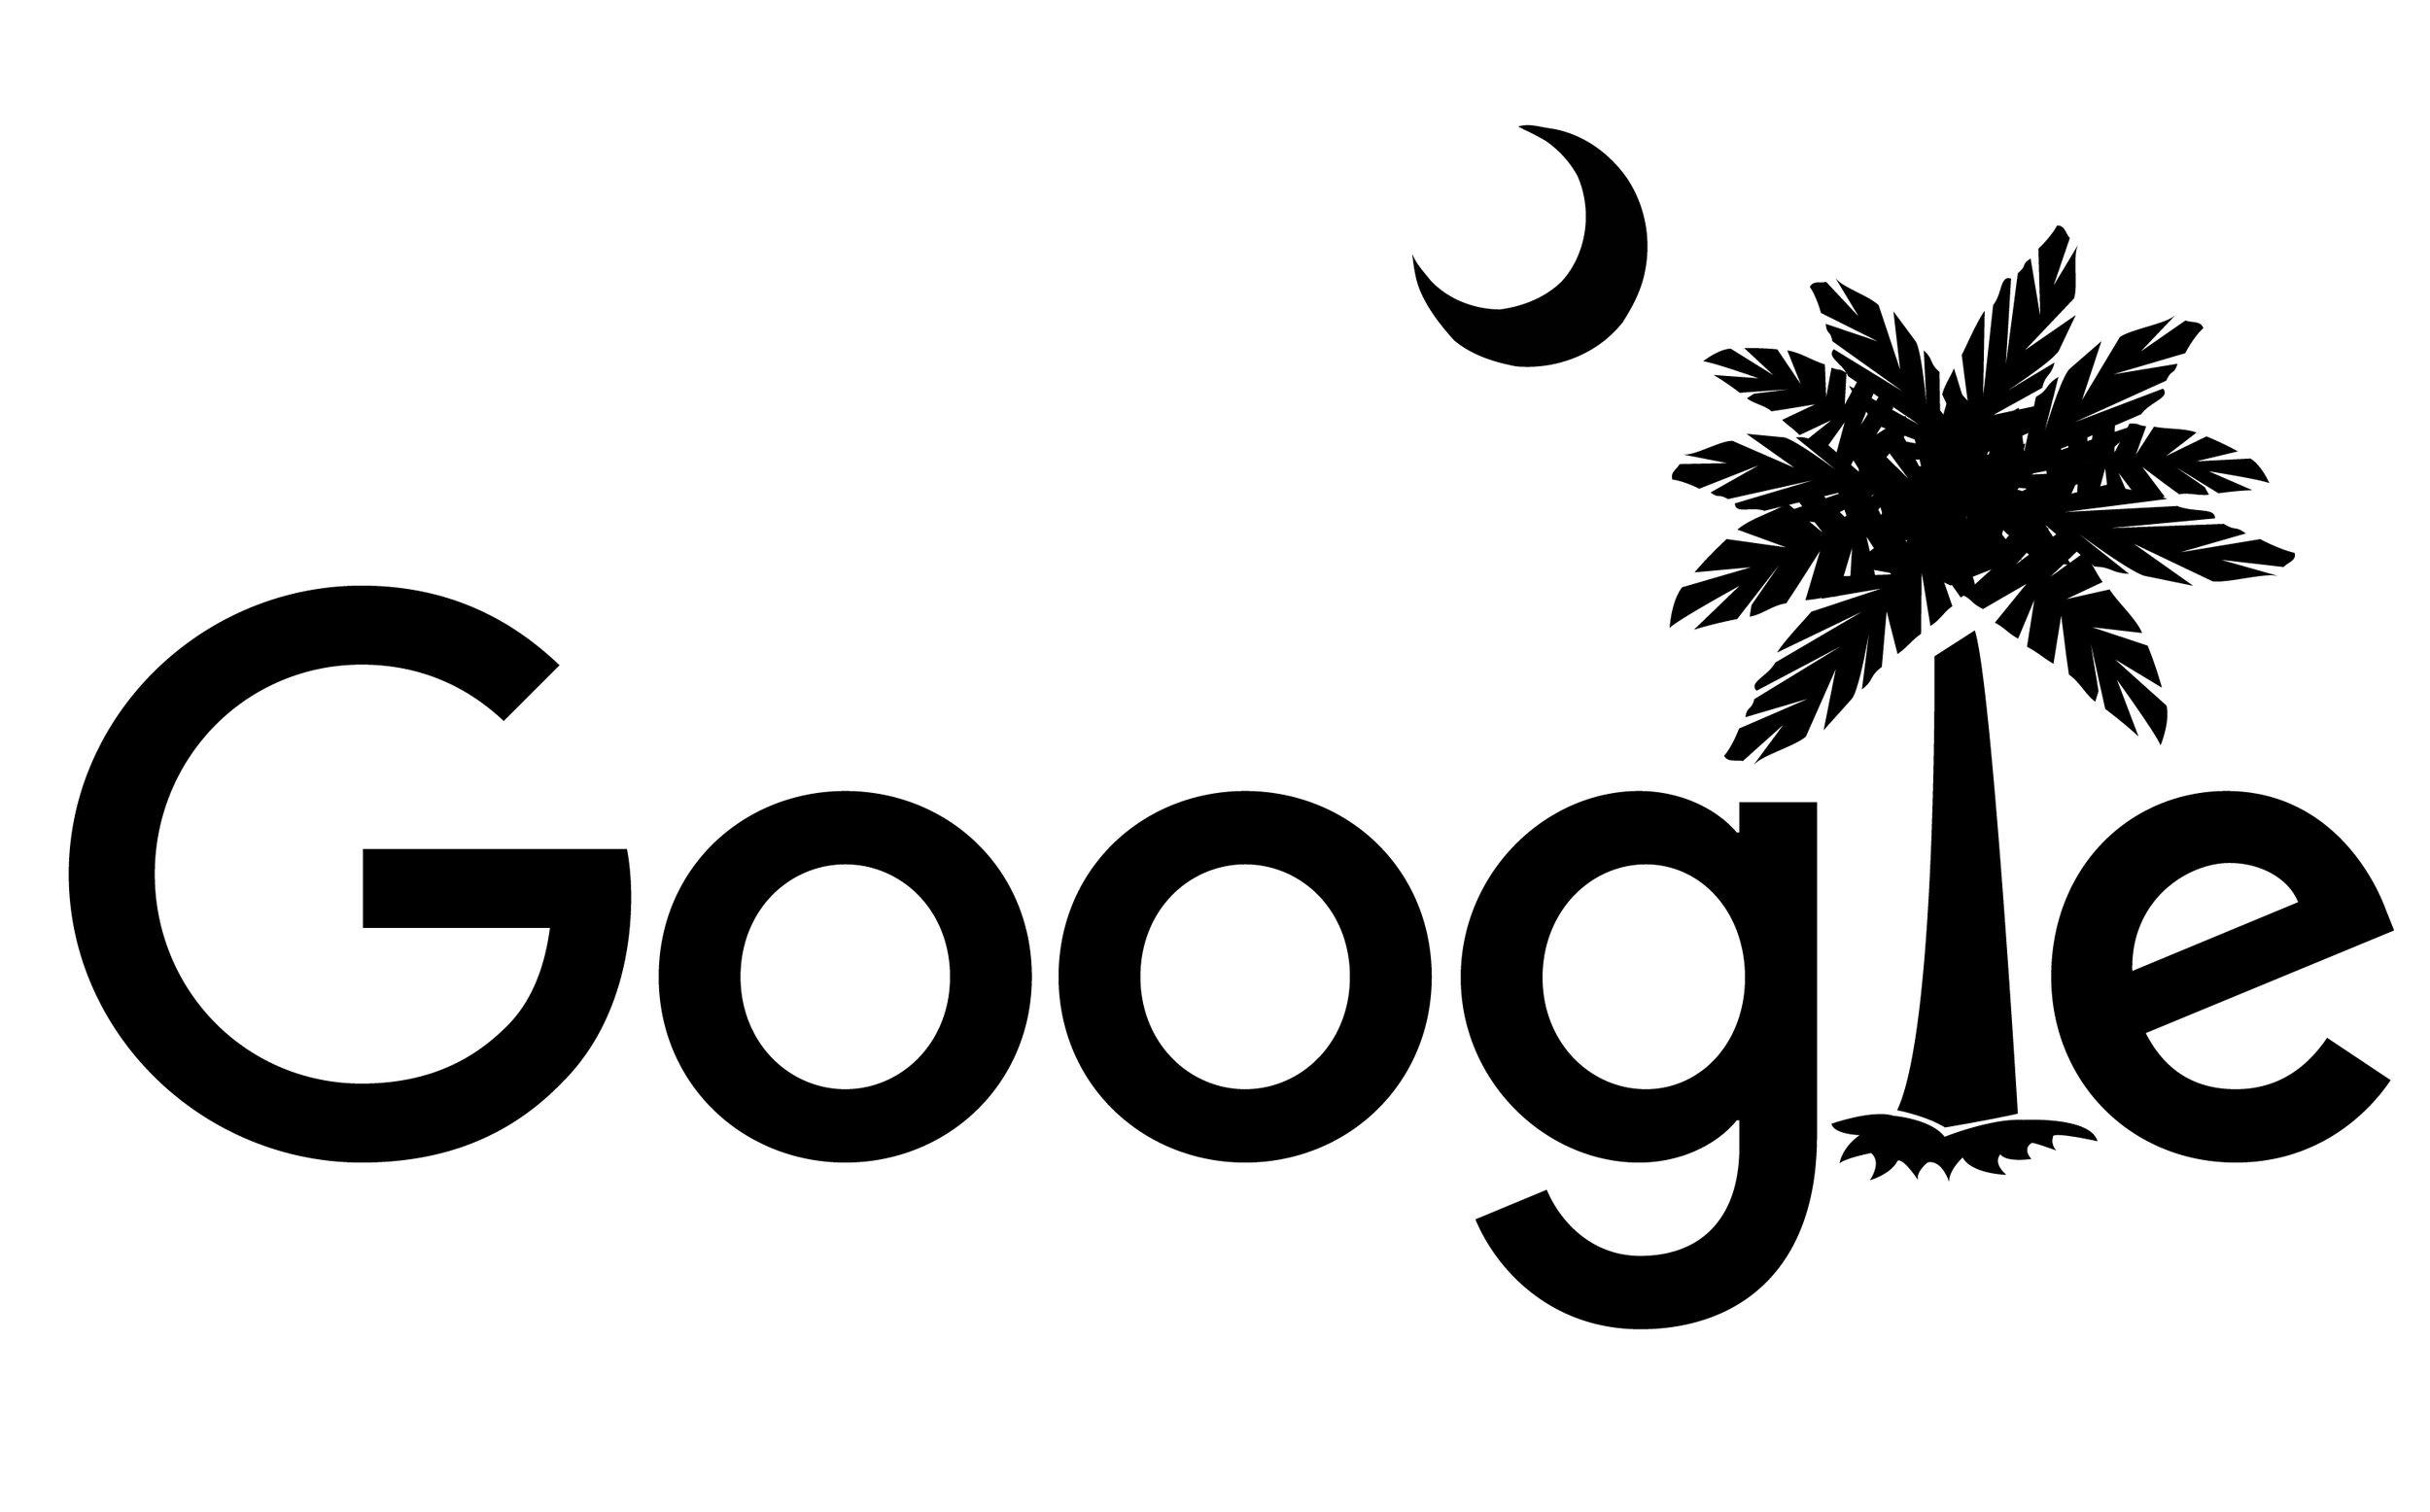 GoogleLogoSC.jpg